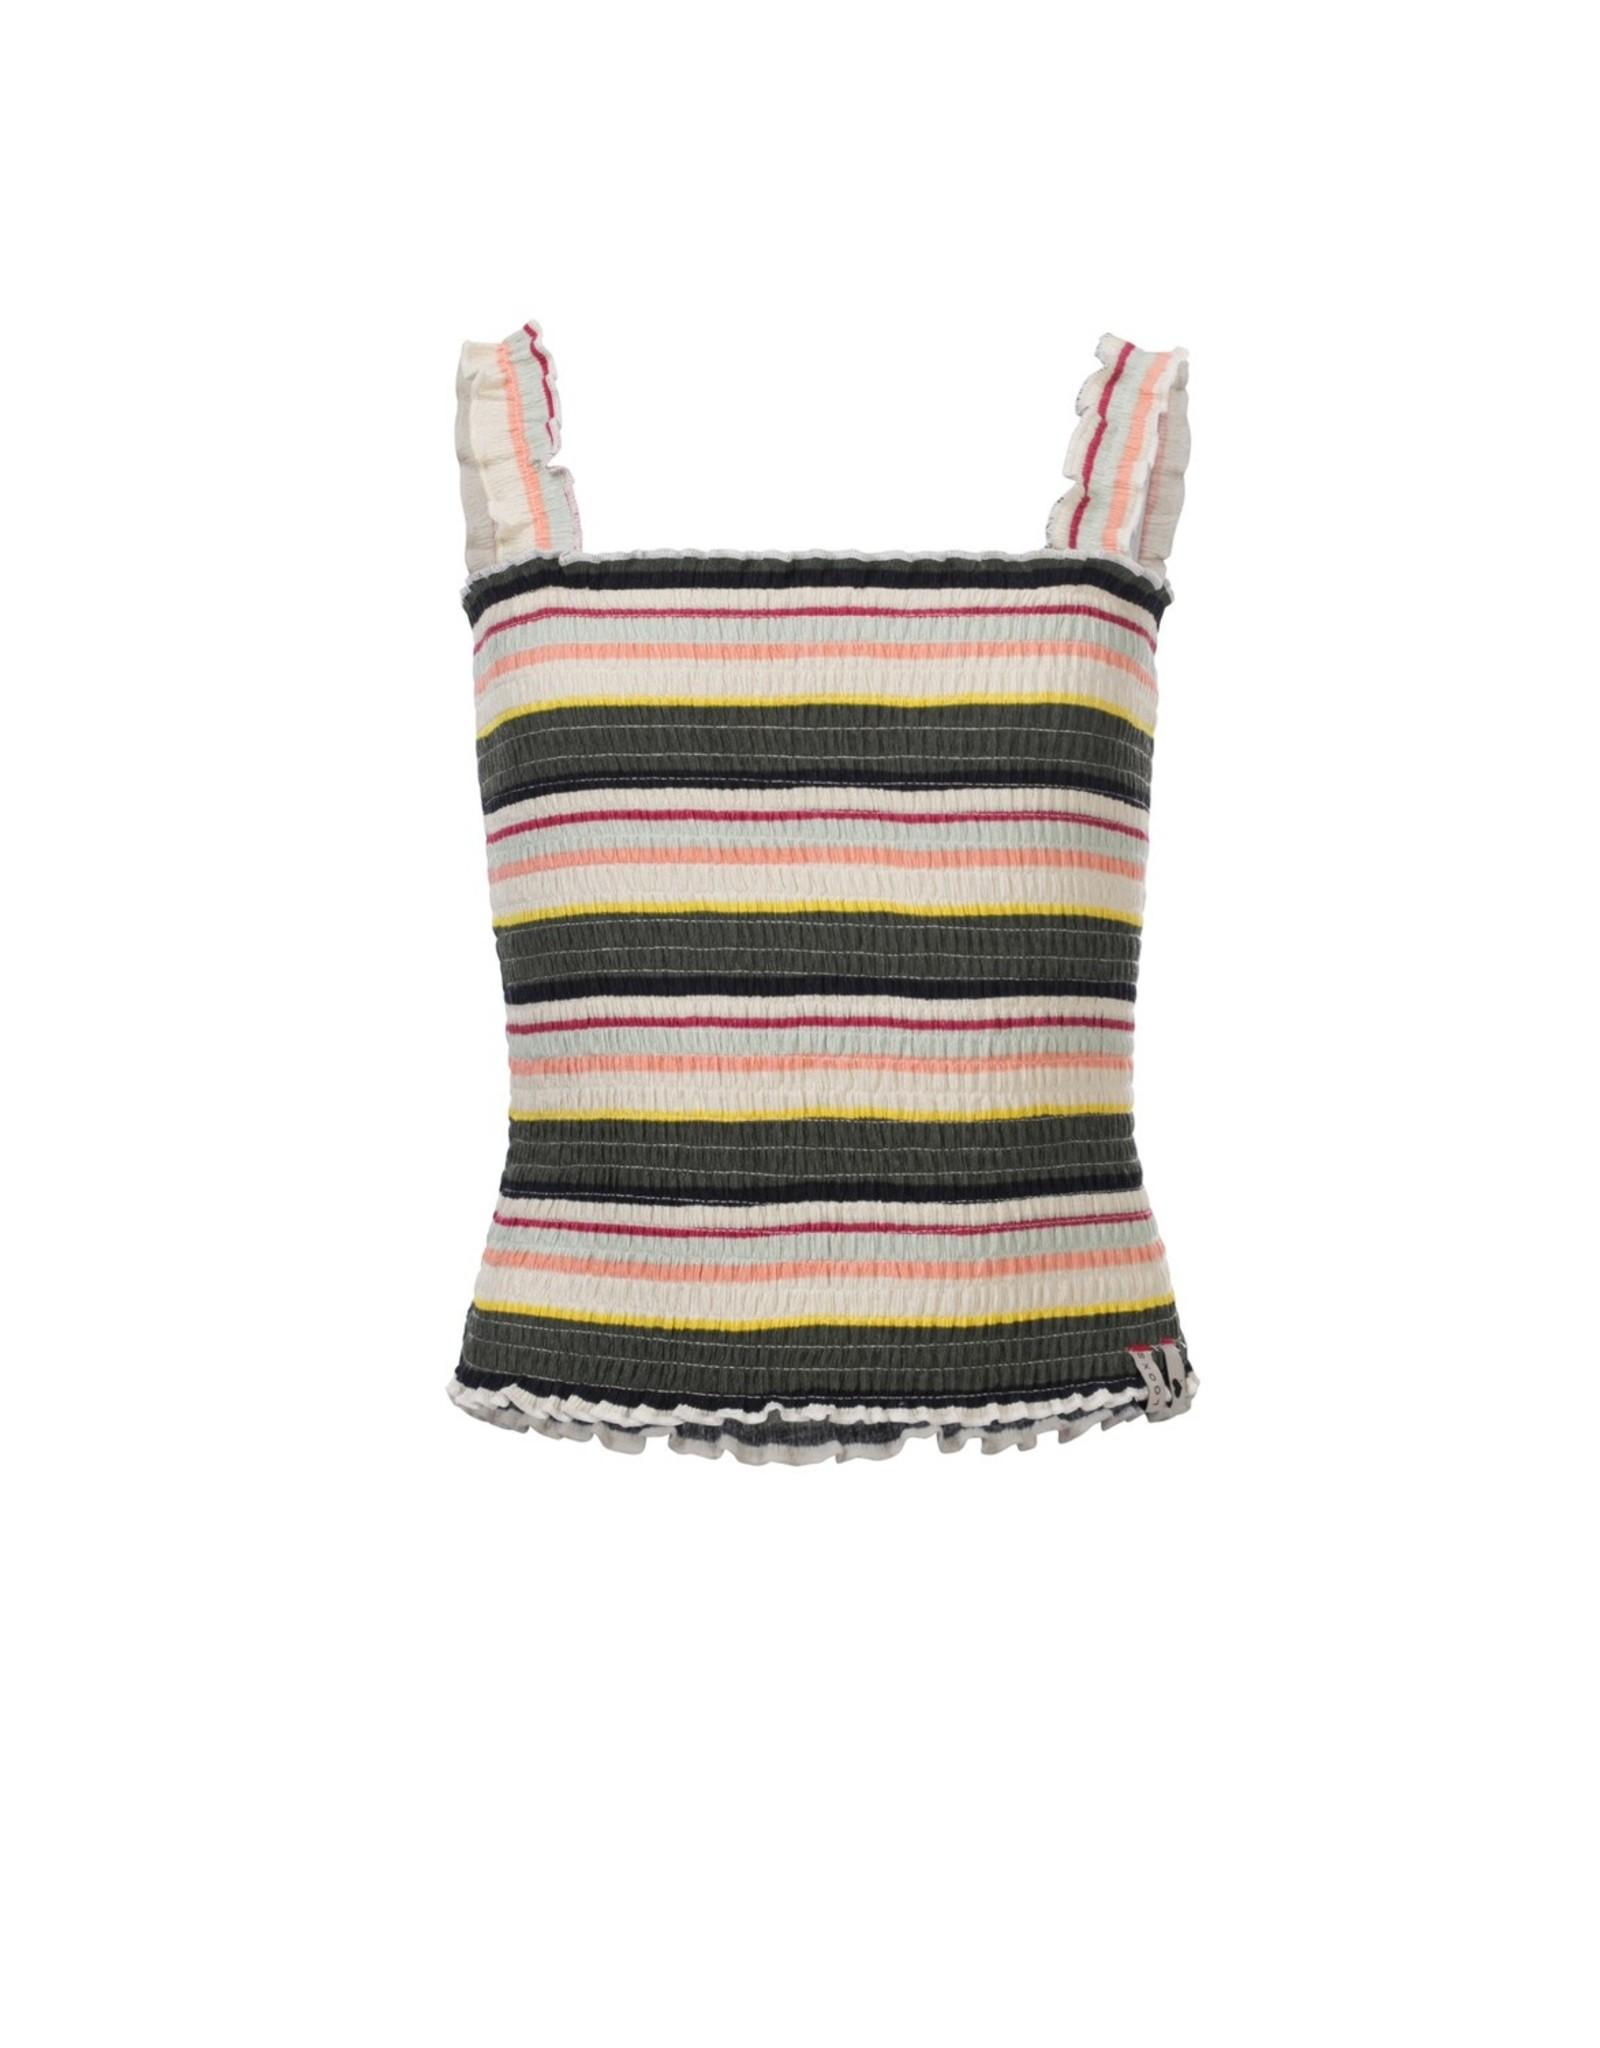 Looxs Girls smock top printed stripe